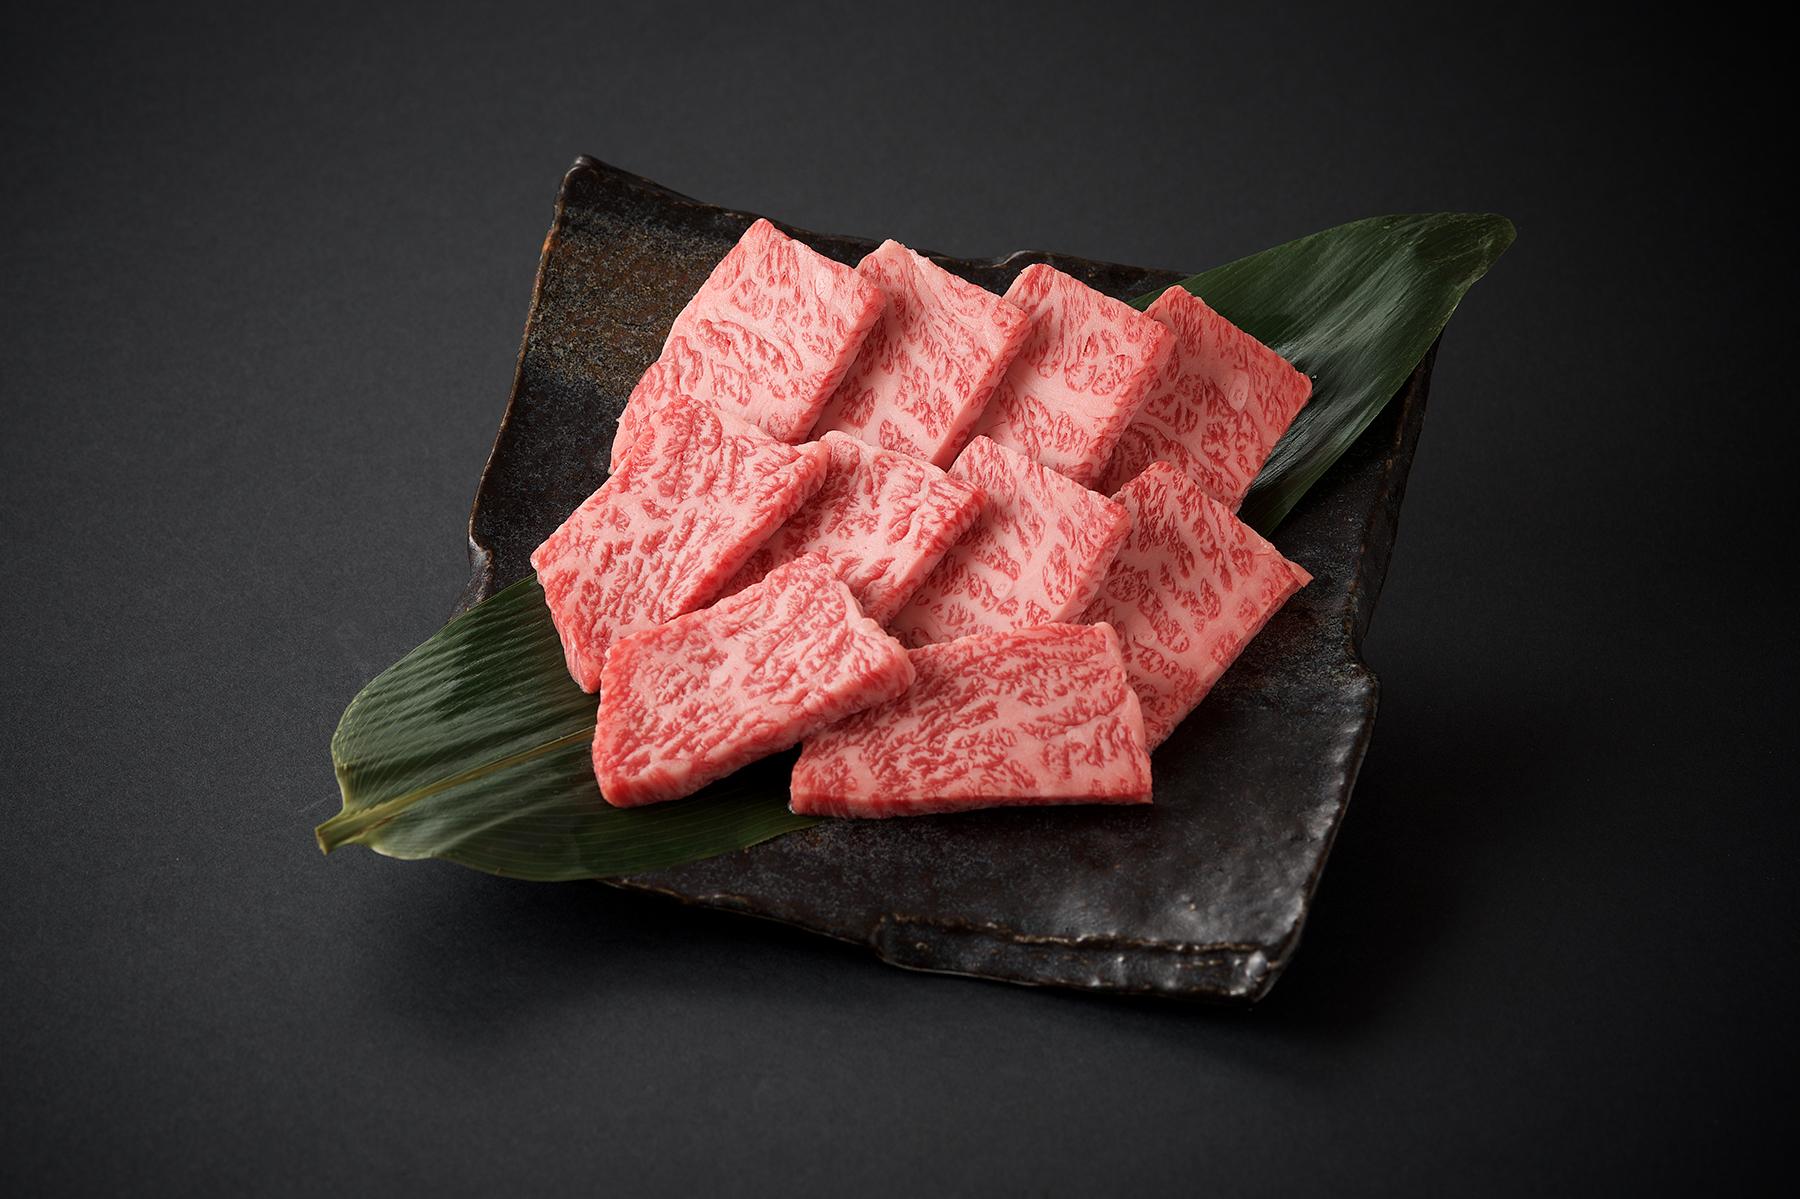 九州産黒毛和牛 ロース焼肉/100g(1200)